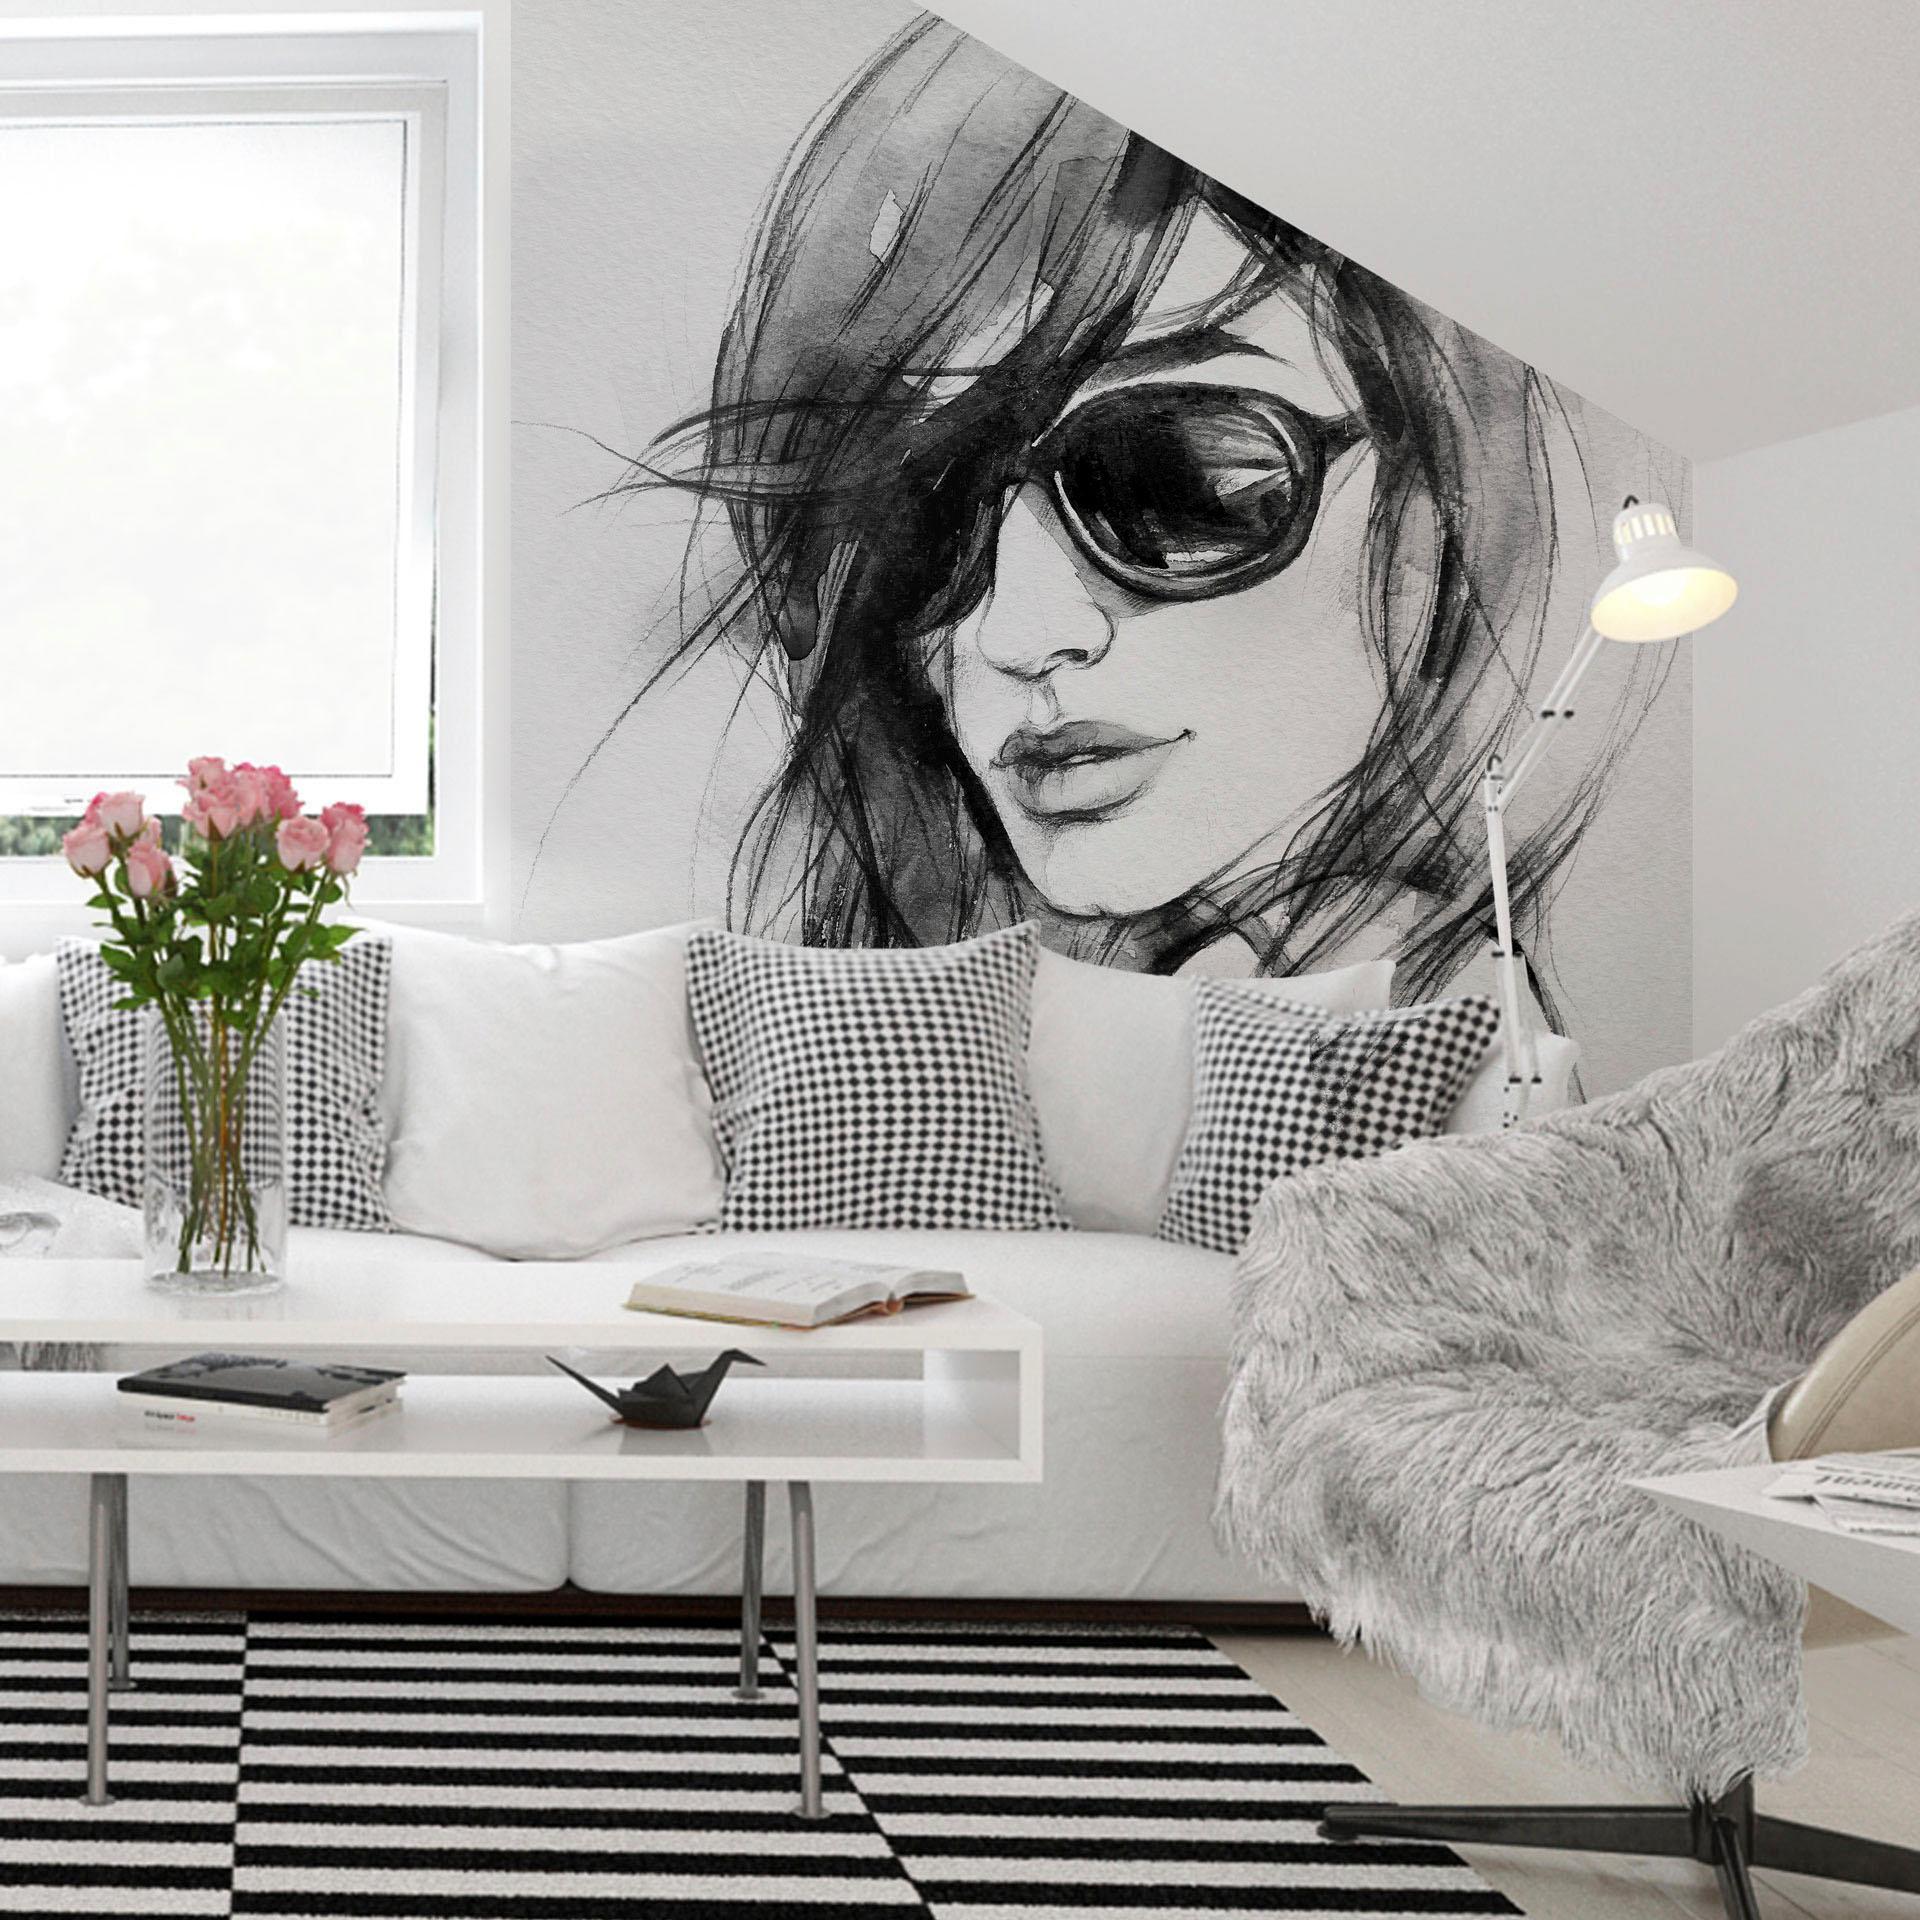 Fototapete I wear my sunglasses 288/260 cm Wohnen/Wohntextilien/Tapeten/Fototapeten/Fototapeten Natur